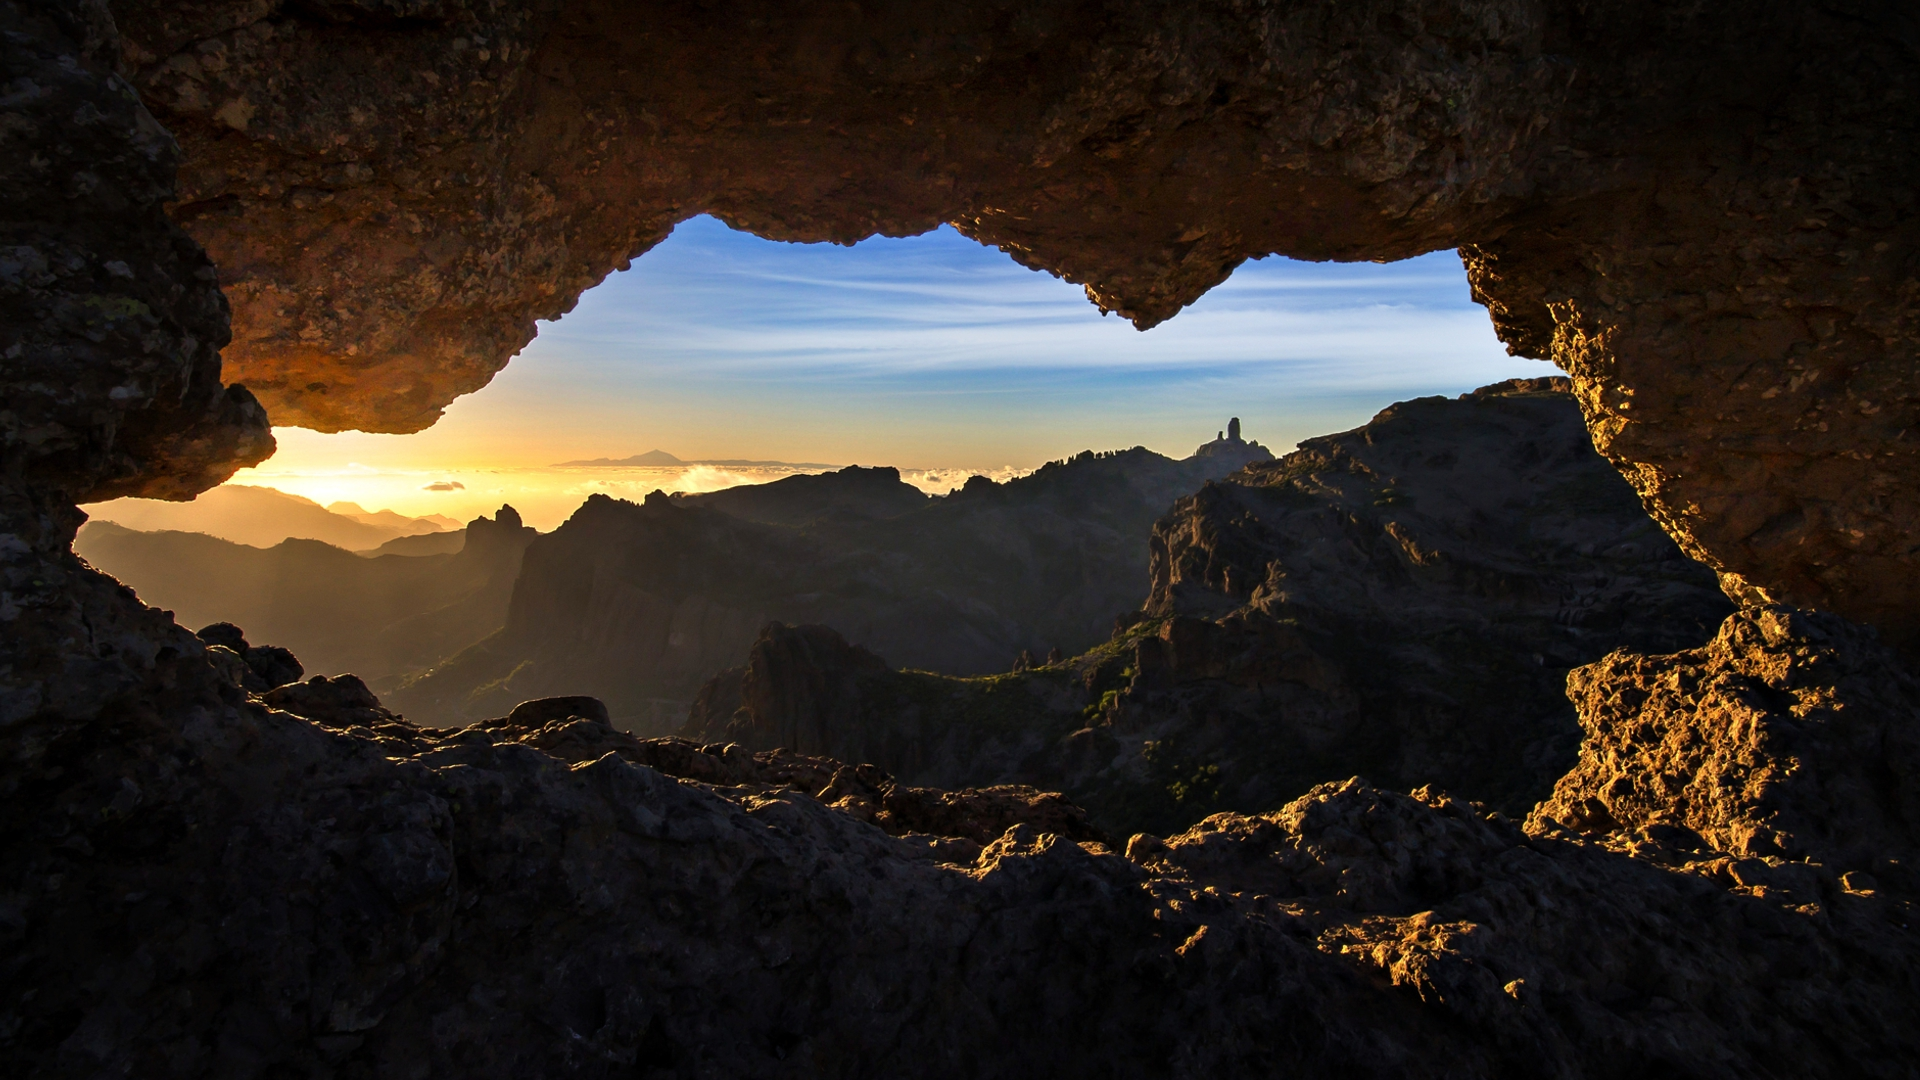 Una Ventana Al Mundo Imagen & Foto